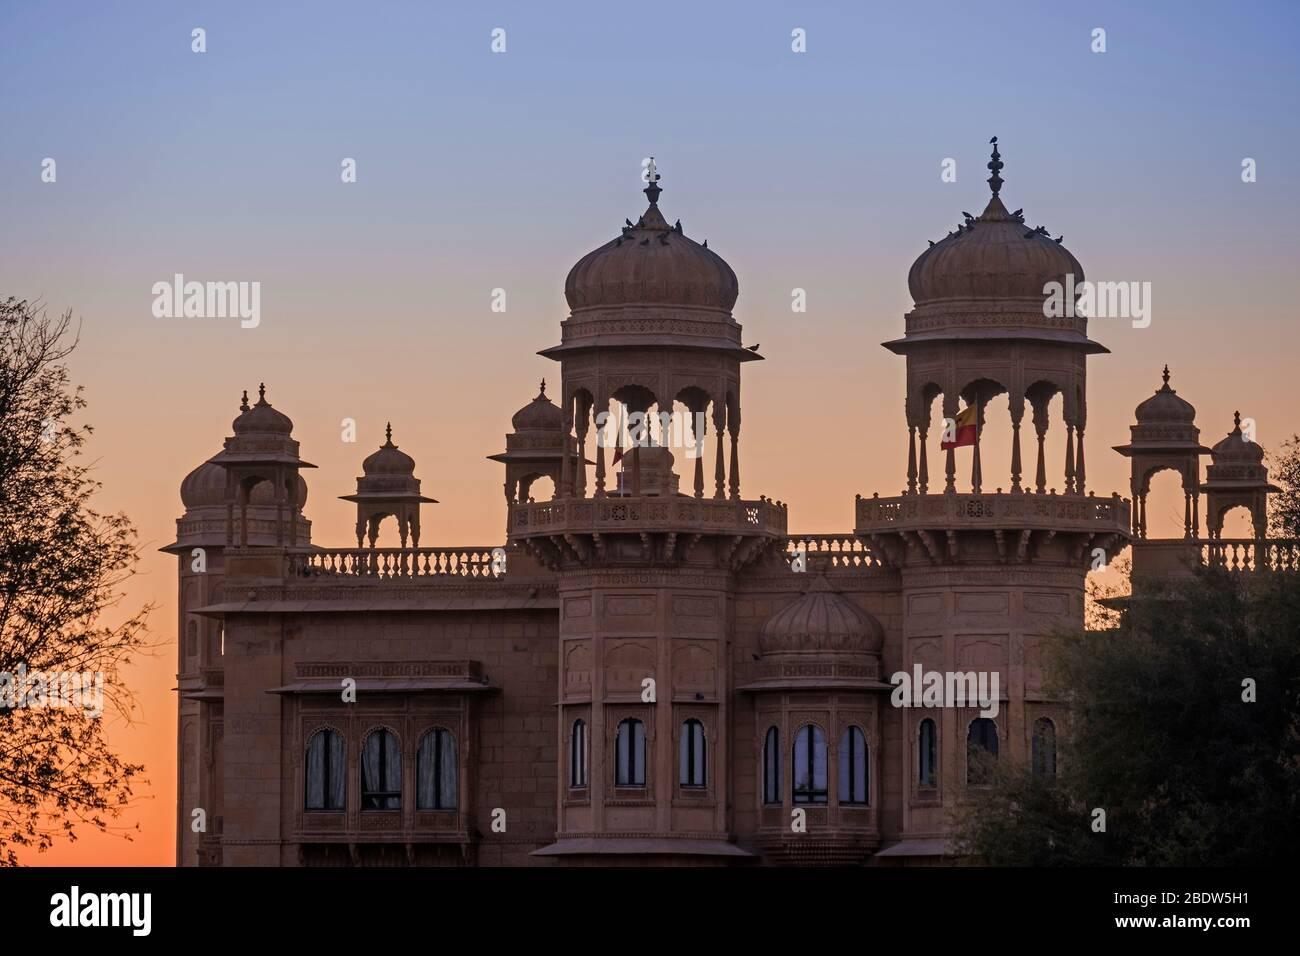 Jawahar Niwas Palace Jaisalmer Rajasthan India Stock Photo